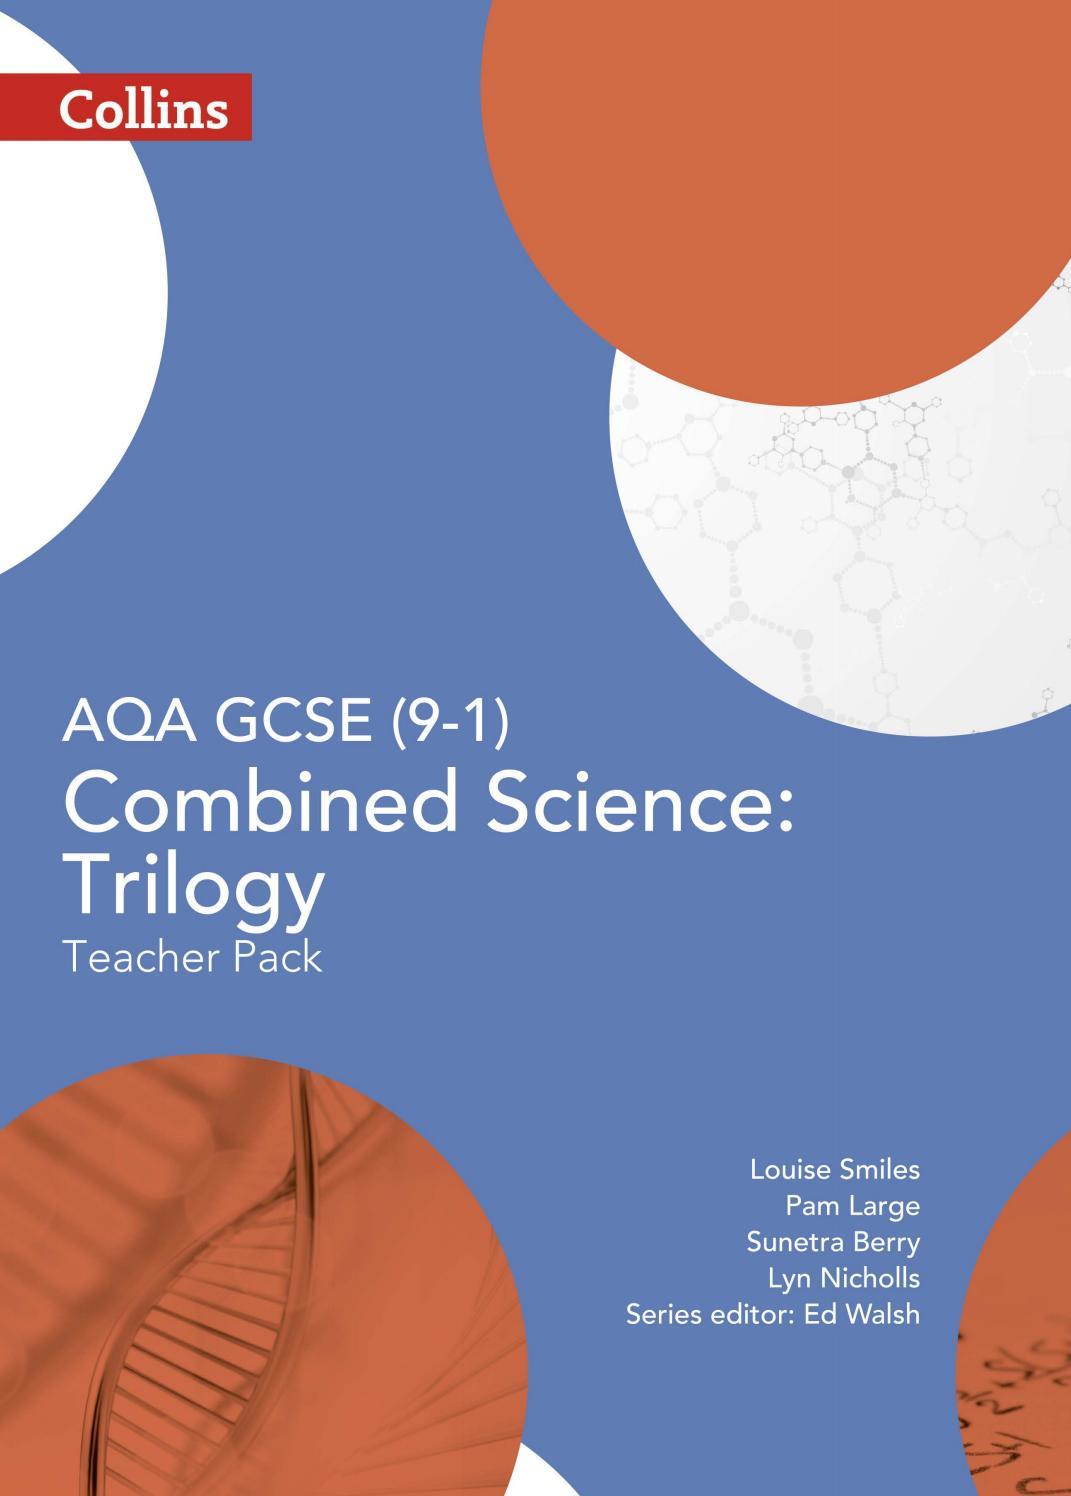 AQA GCSE Revision Checklist  Physics